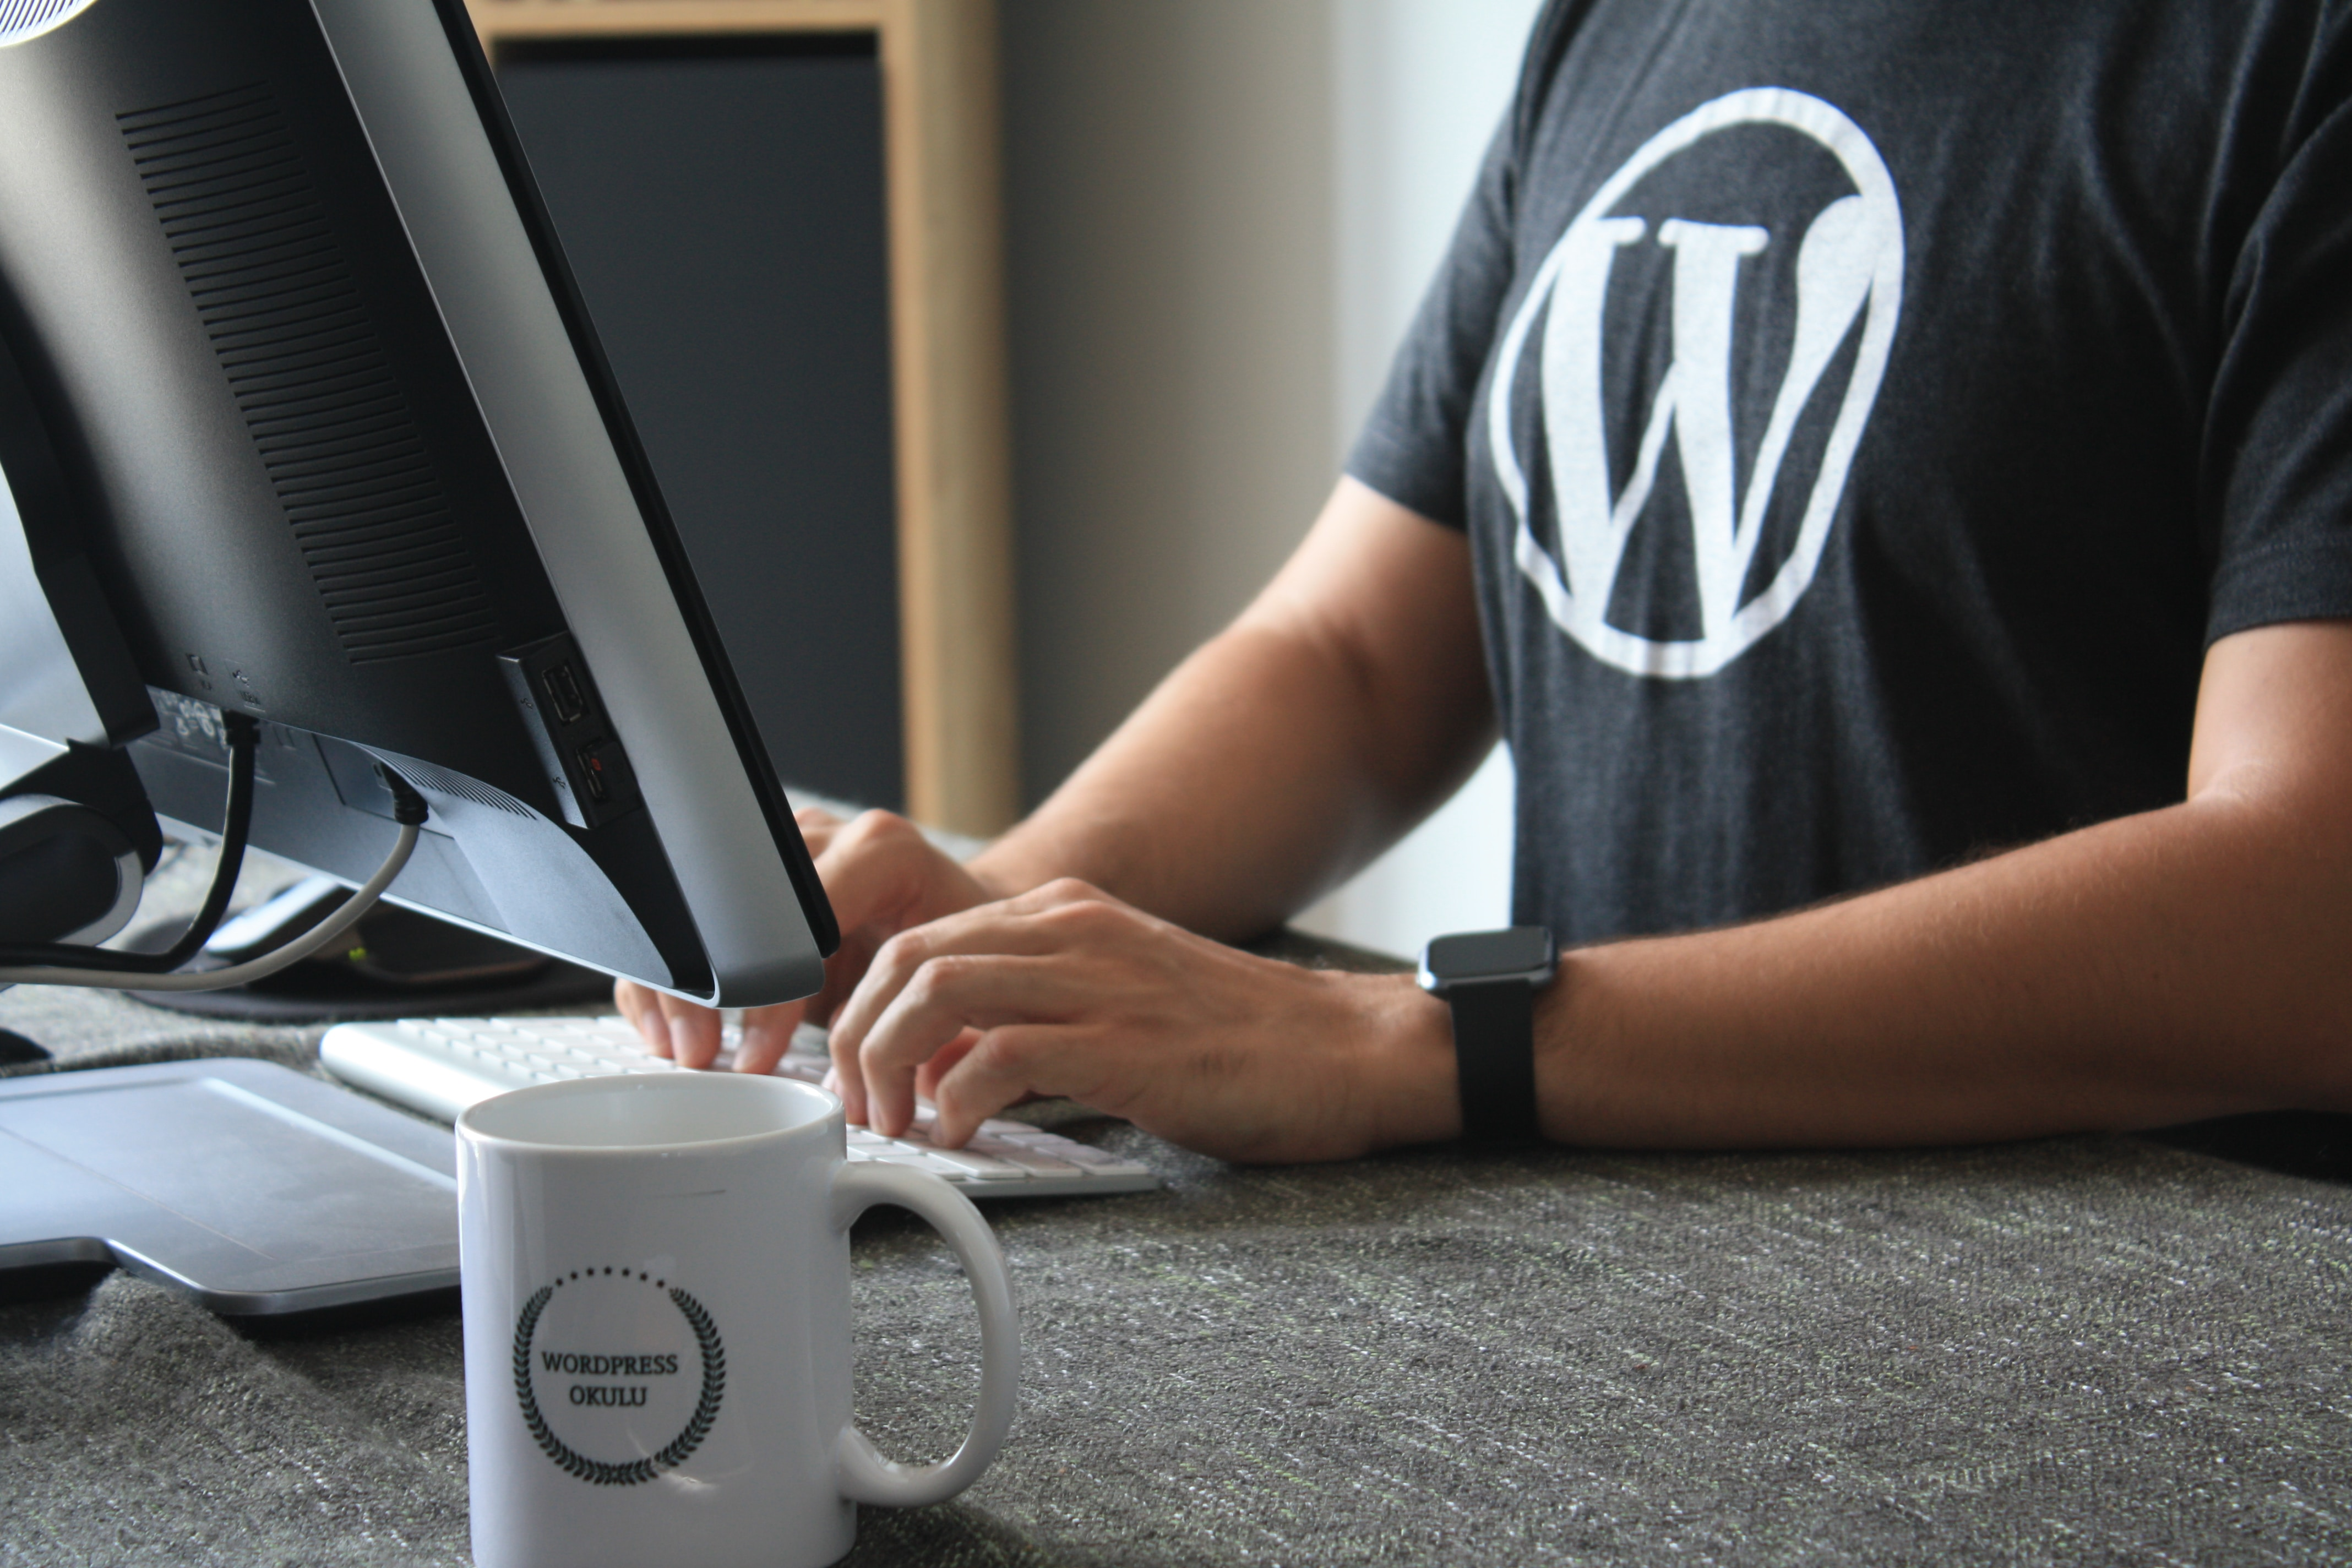 👨💼 U stolyci vidbudeťsja WordCamp Kyiv — vseukraїnśka konferencija z WordPress